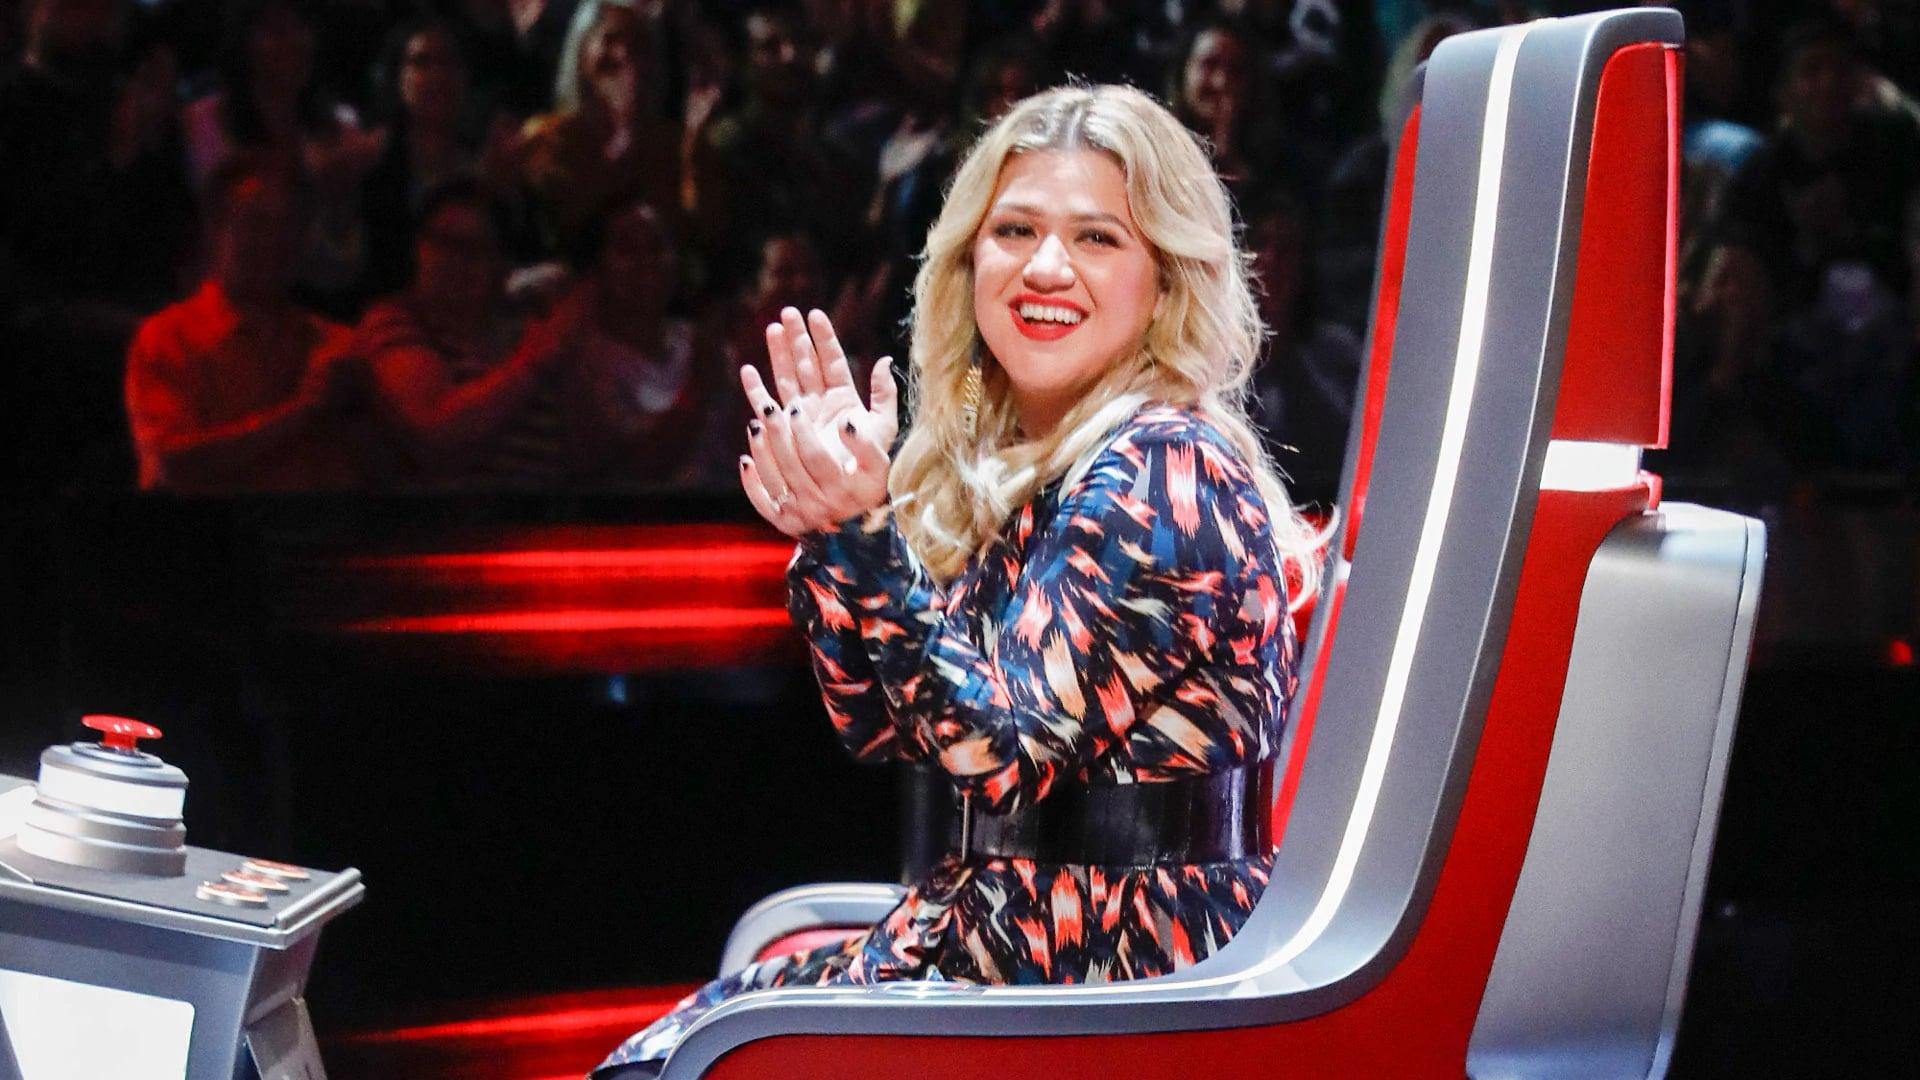 The Voice - Season 17 Episode 7 : The Blind Auditions, Part 7/ The Battles Premiere